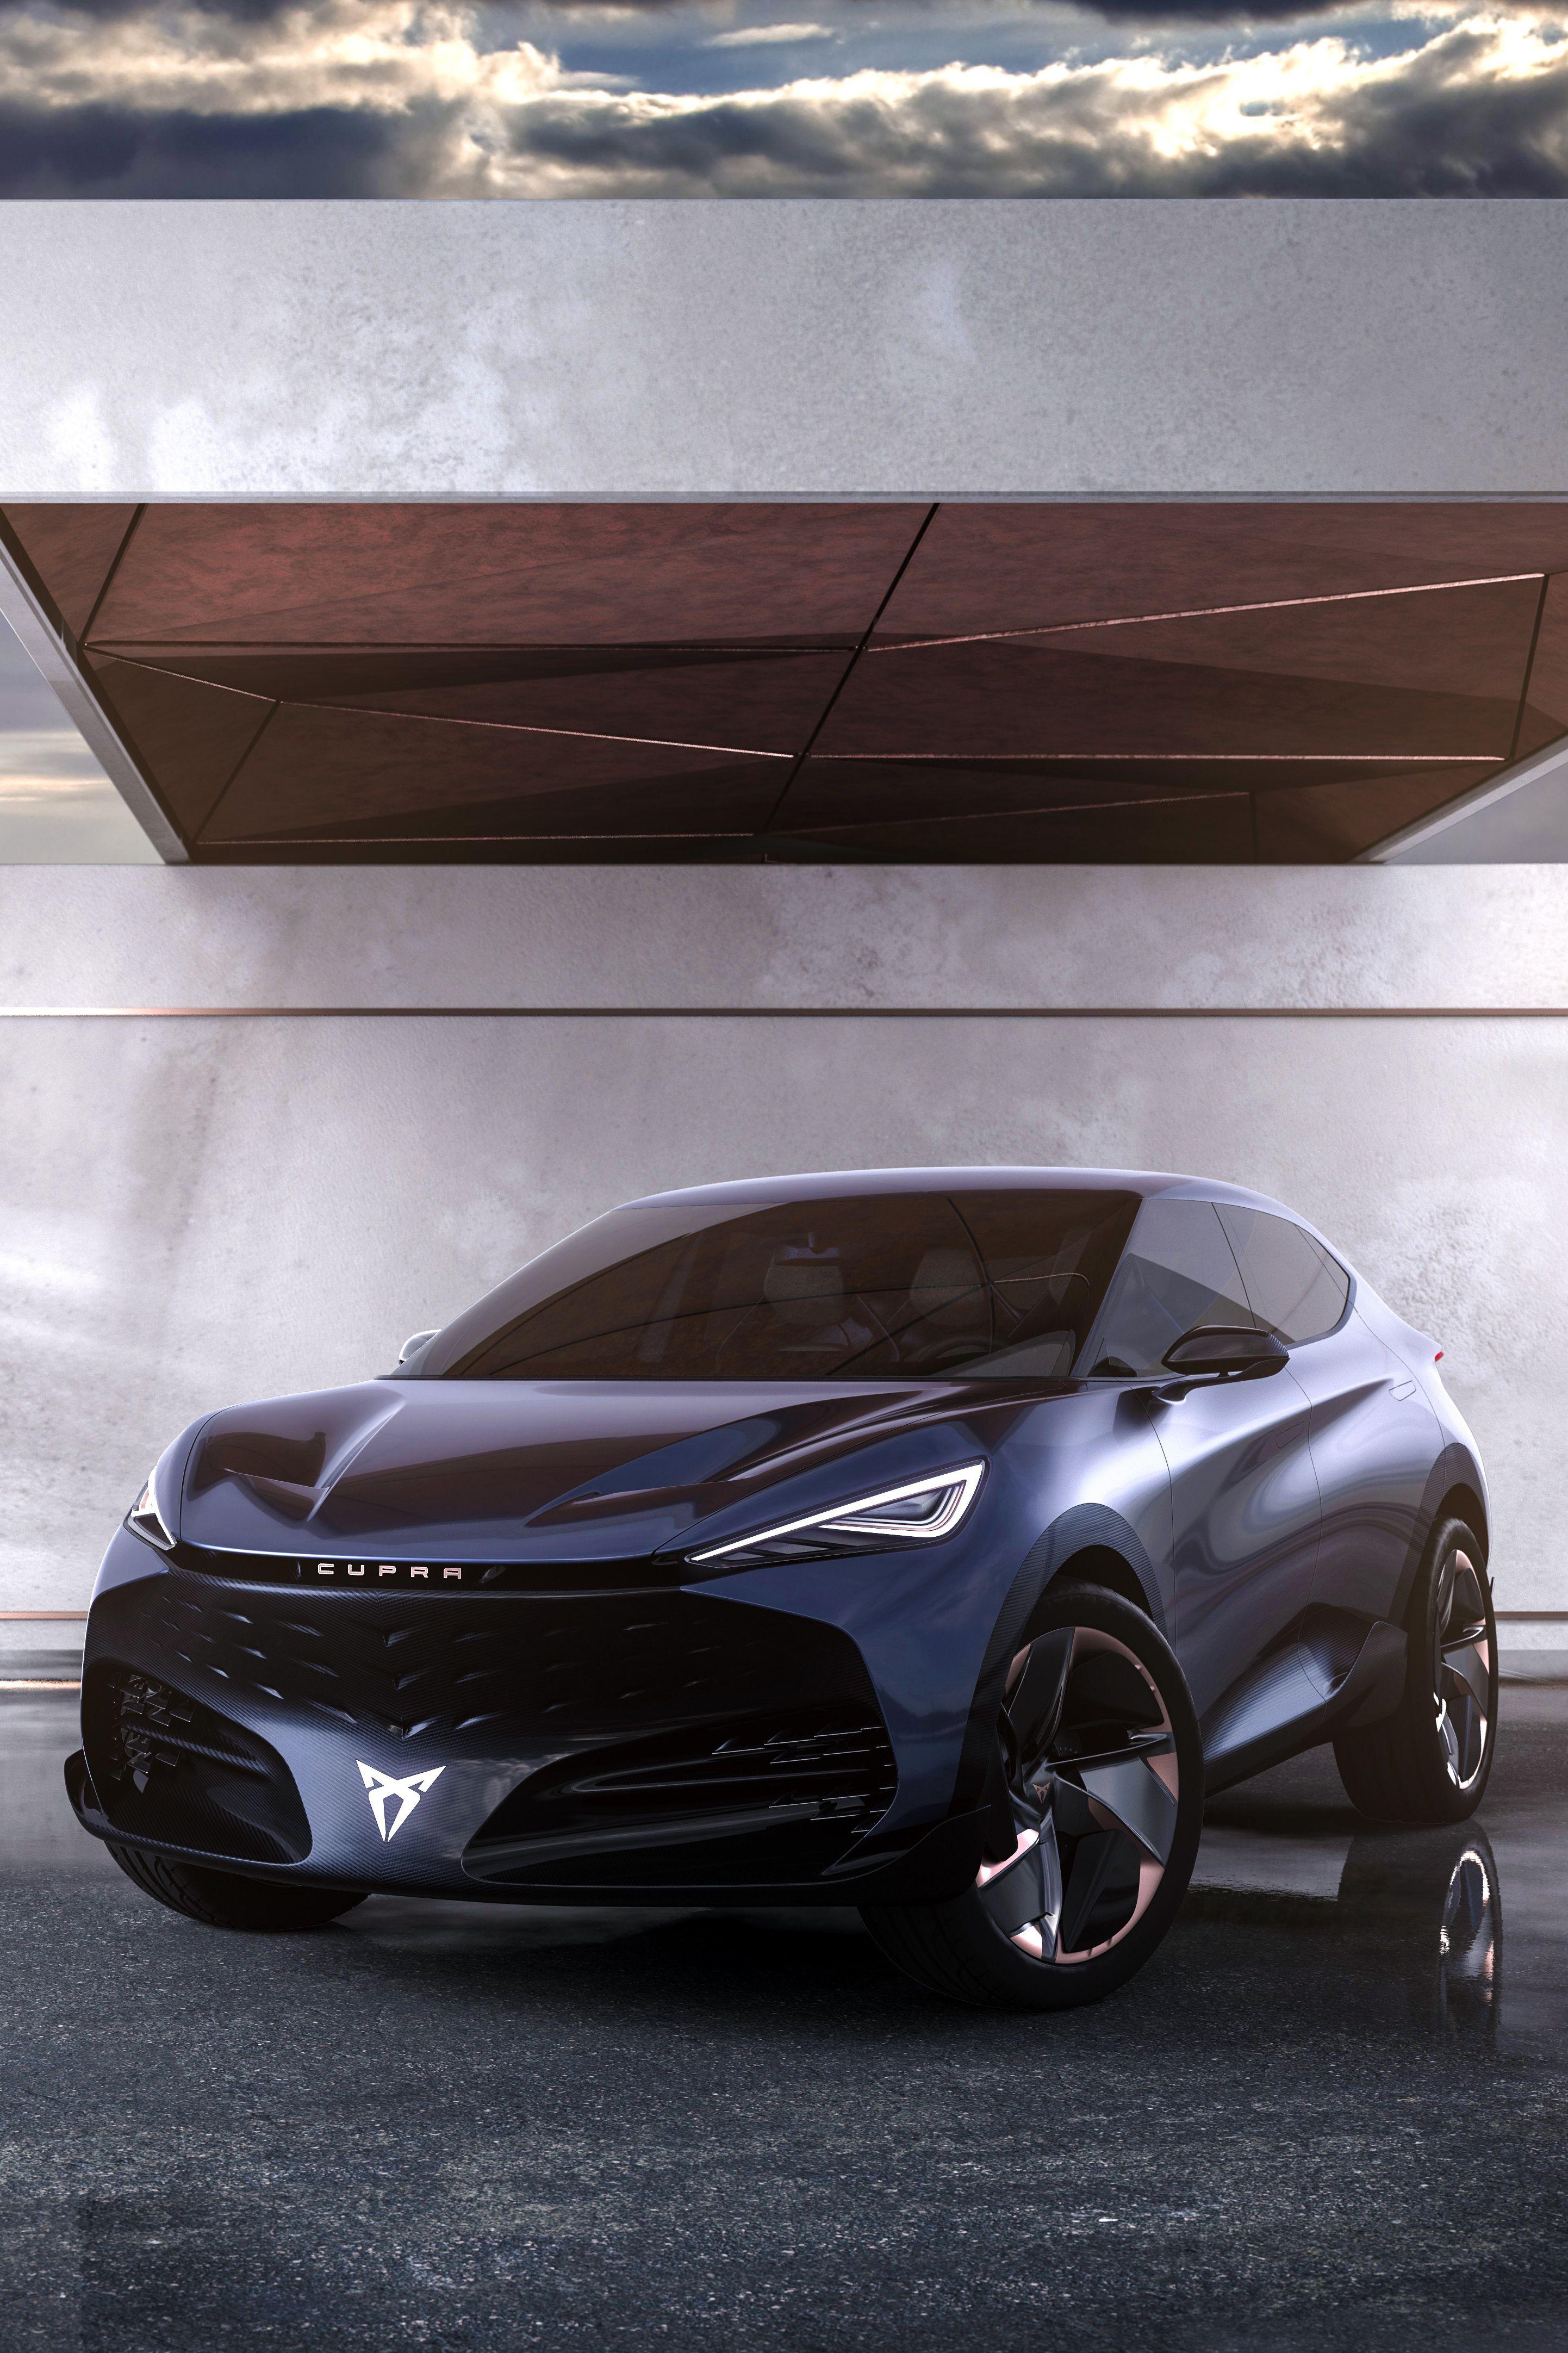 2019 Cupra Tavascan Concept The Man Cupra Concept Future Electric Car Concept Custom Bmw Audi Supercar